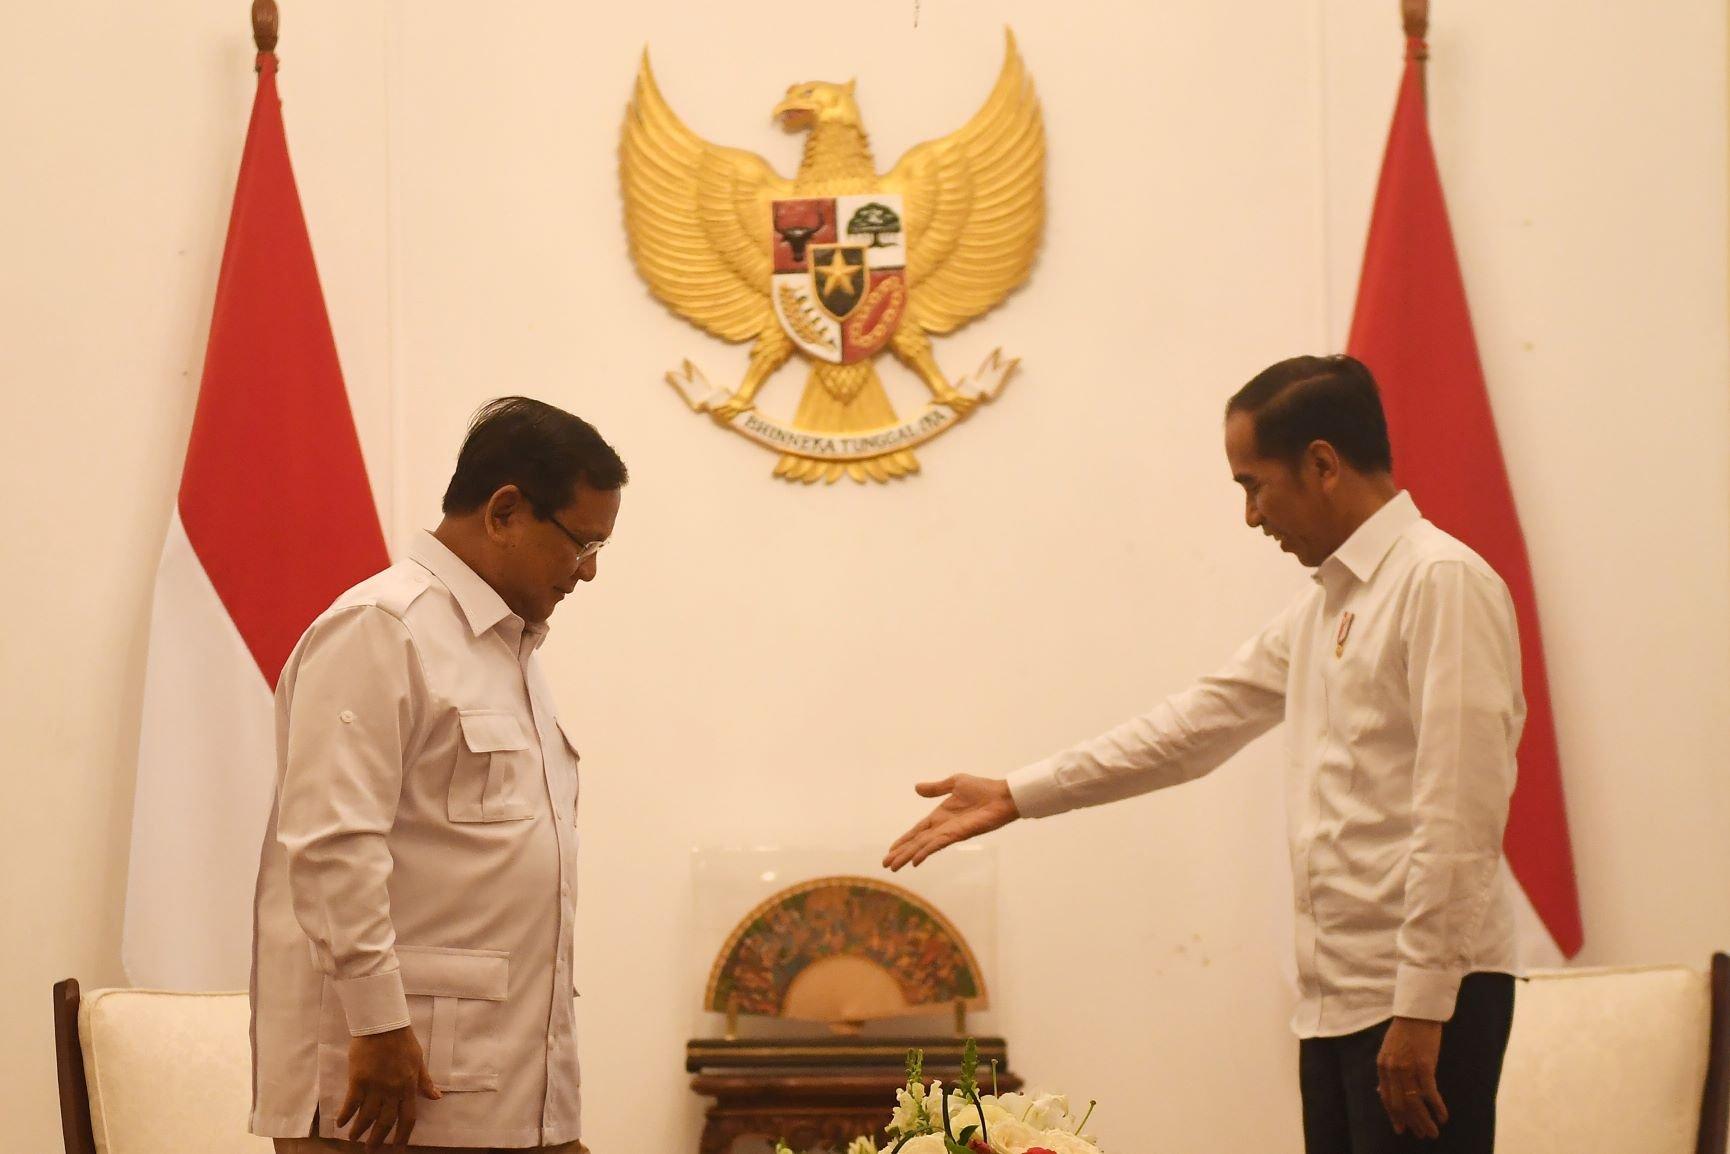 prabowo bertemu jokowi, gerindra masuk koalisi, bocoran kabinet jokowi maruf, susunan kabinet jokowi maruf